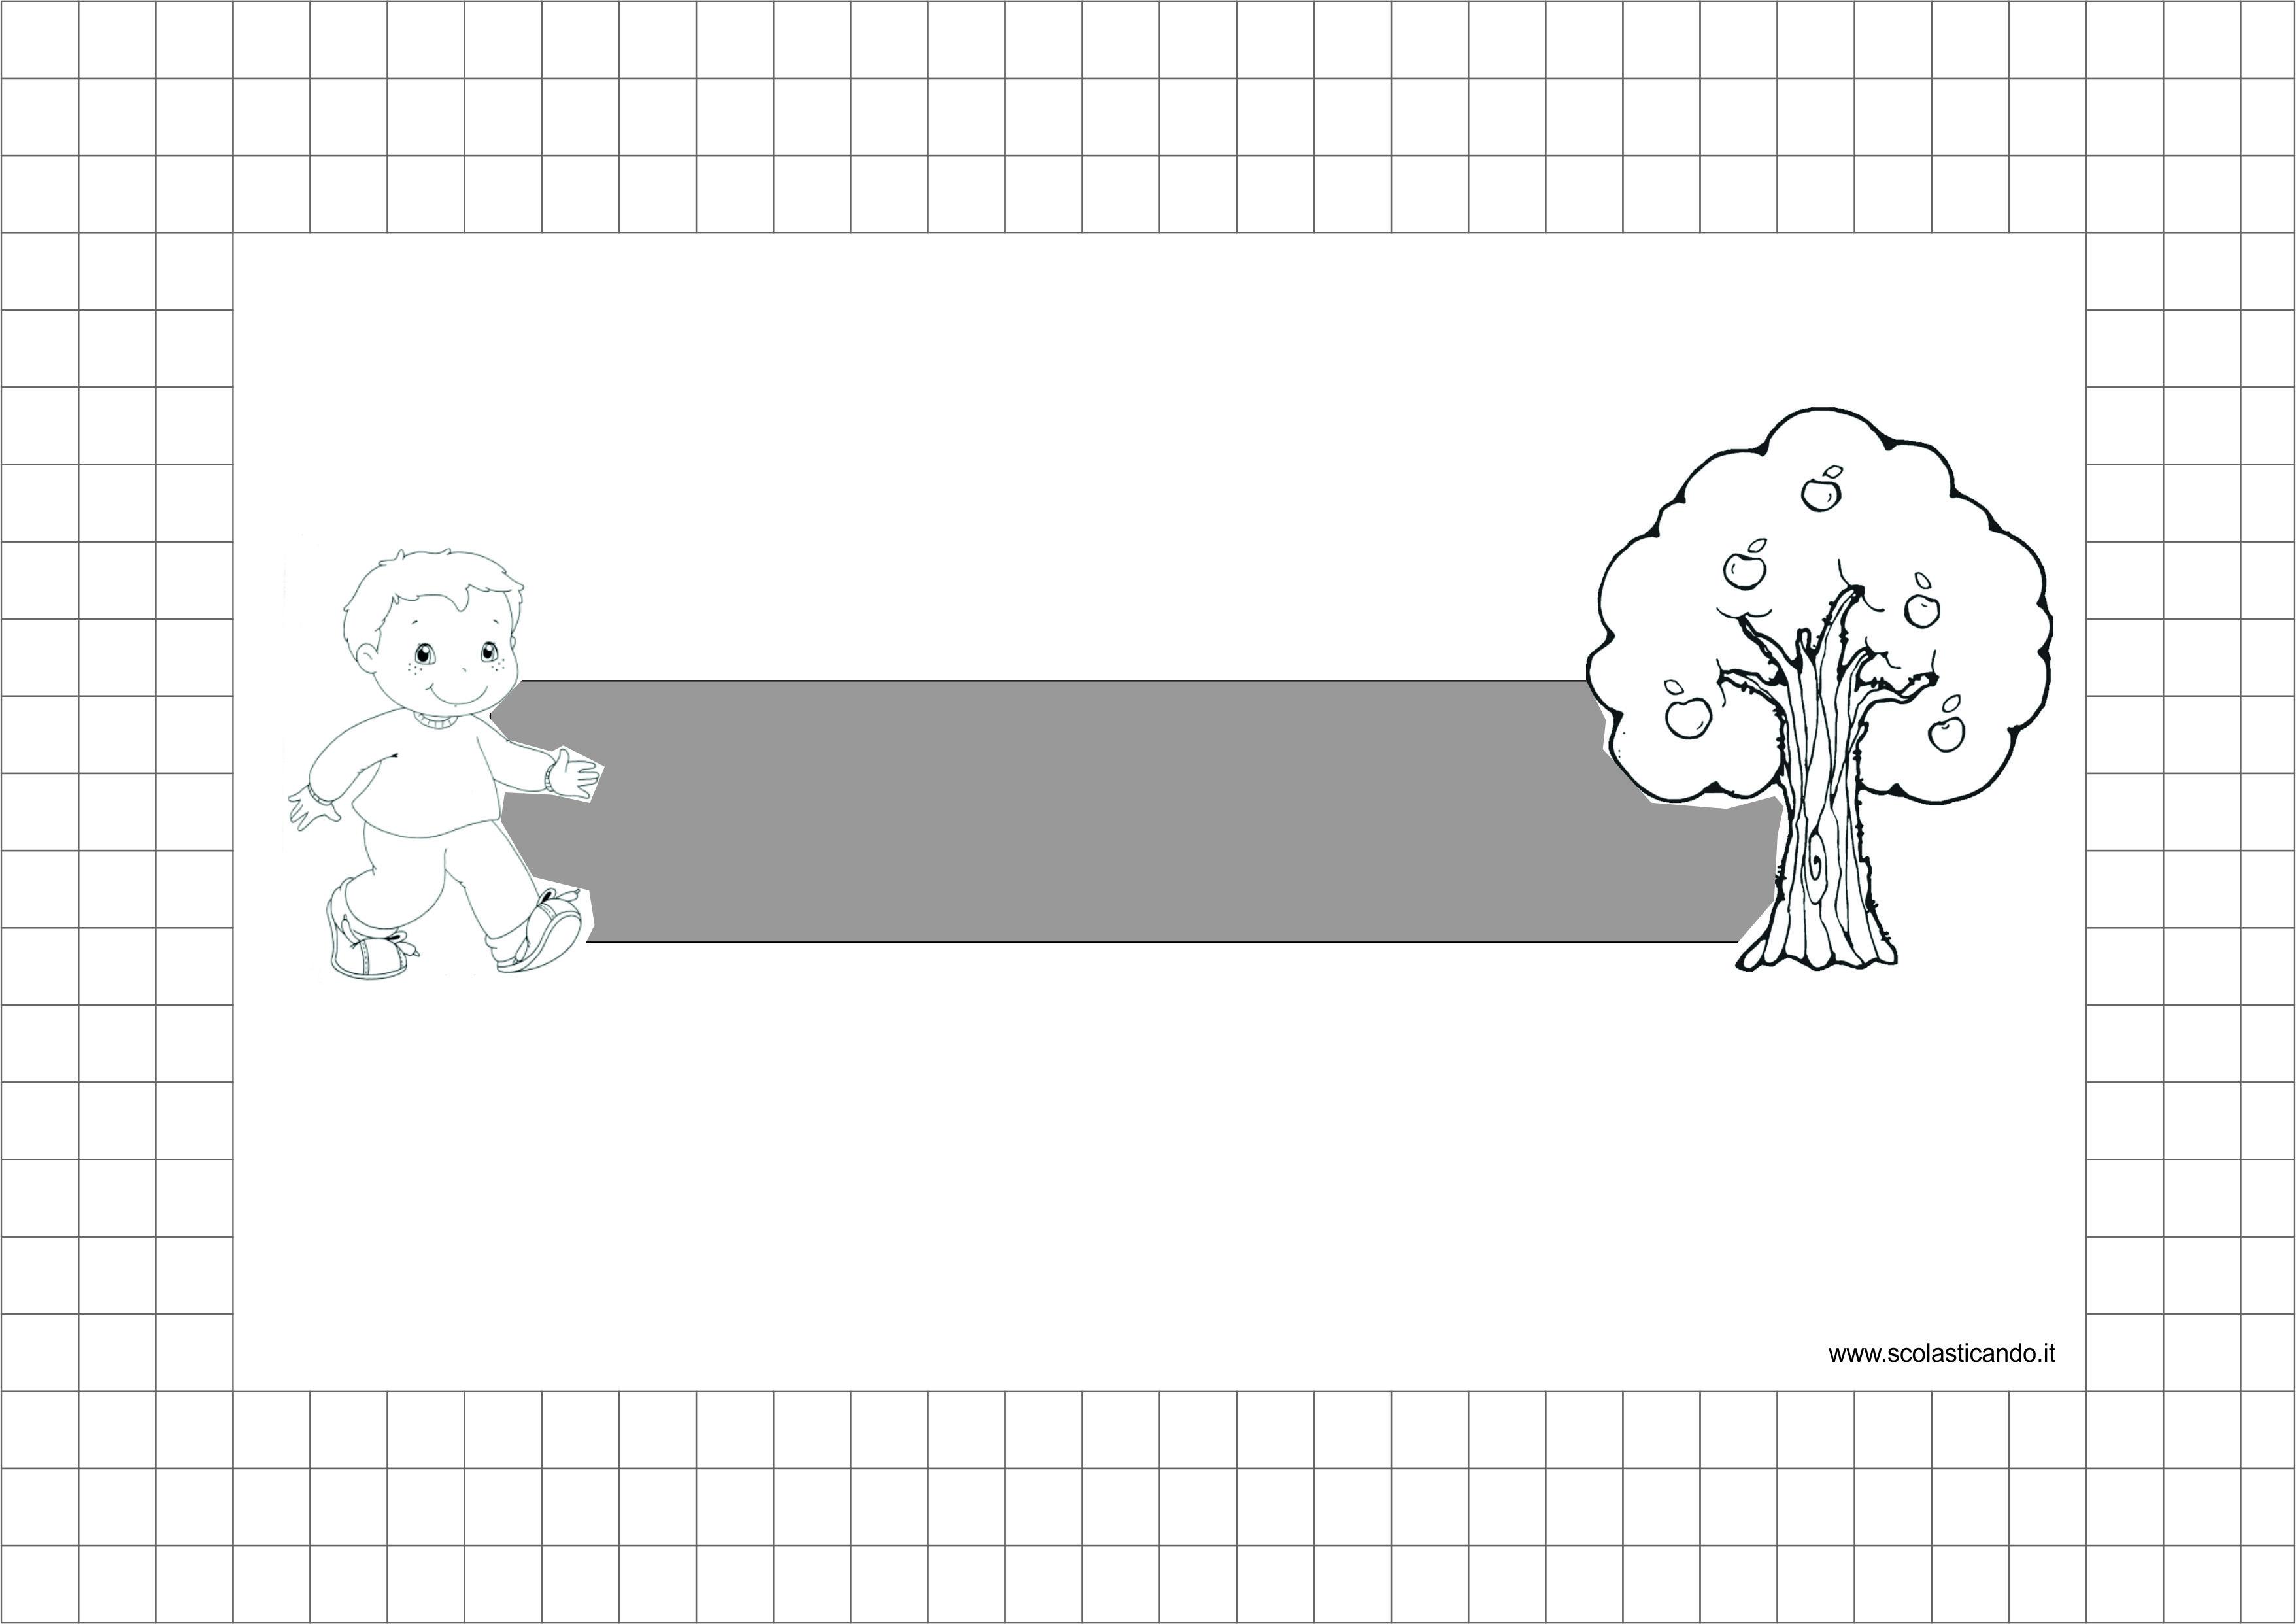 Preferenza Frostig: esercizi di coordinazione visuo-motoria, schede 1-6 BP99